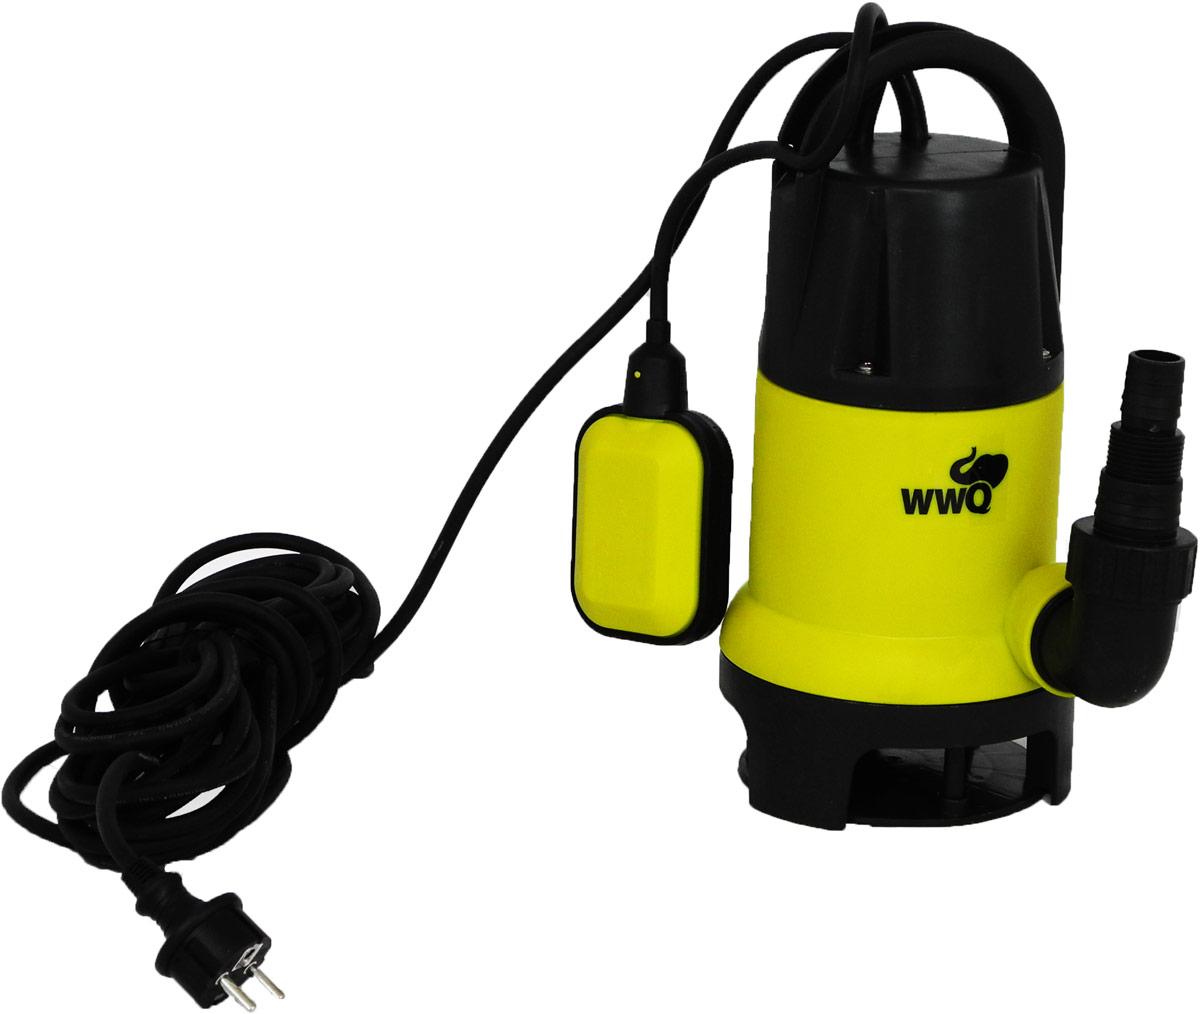 все цены на Насос дренажный WWQ NF-600 онлайн